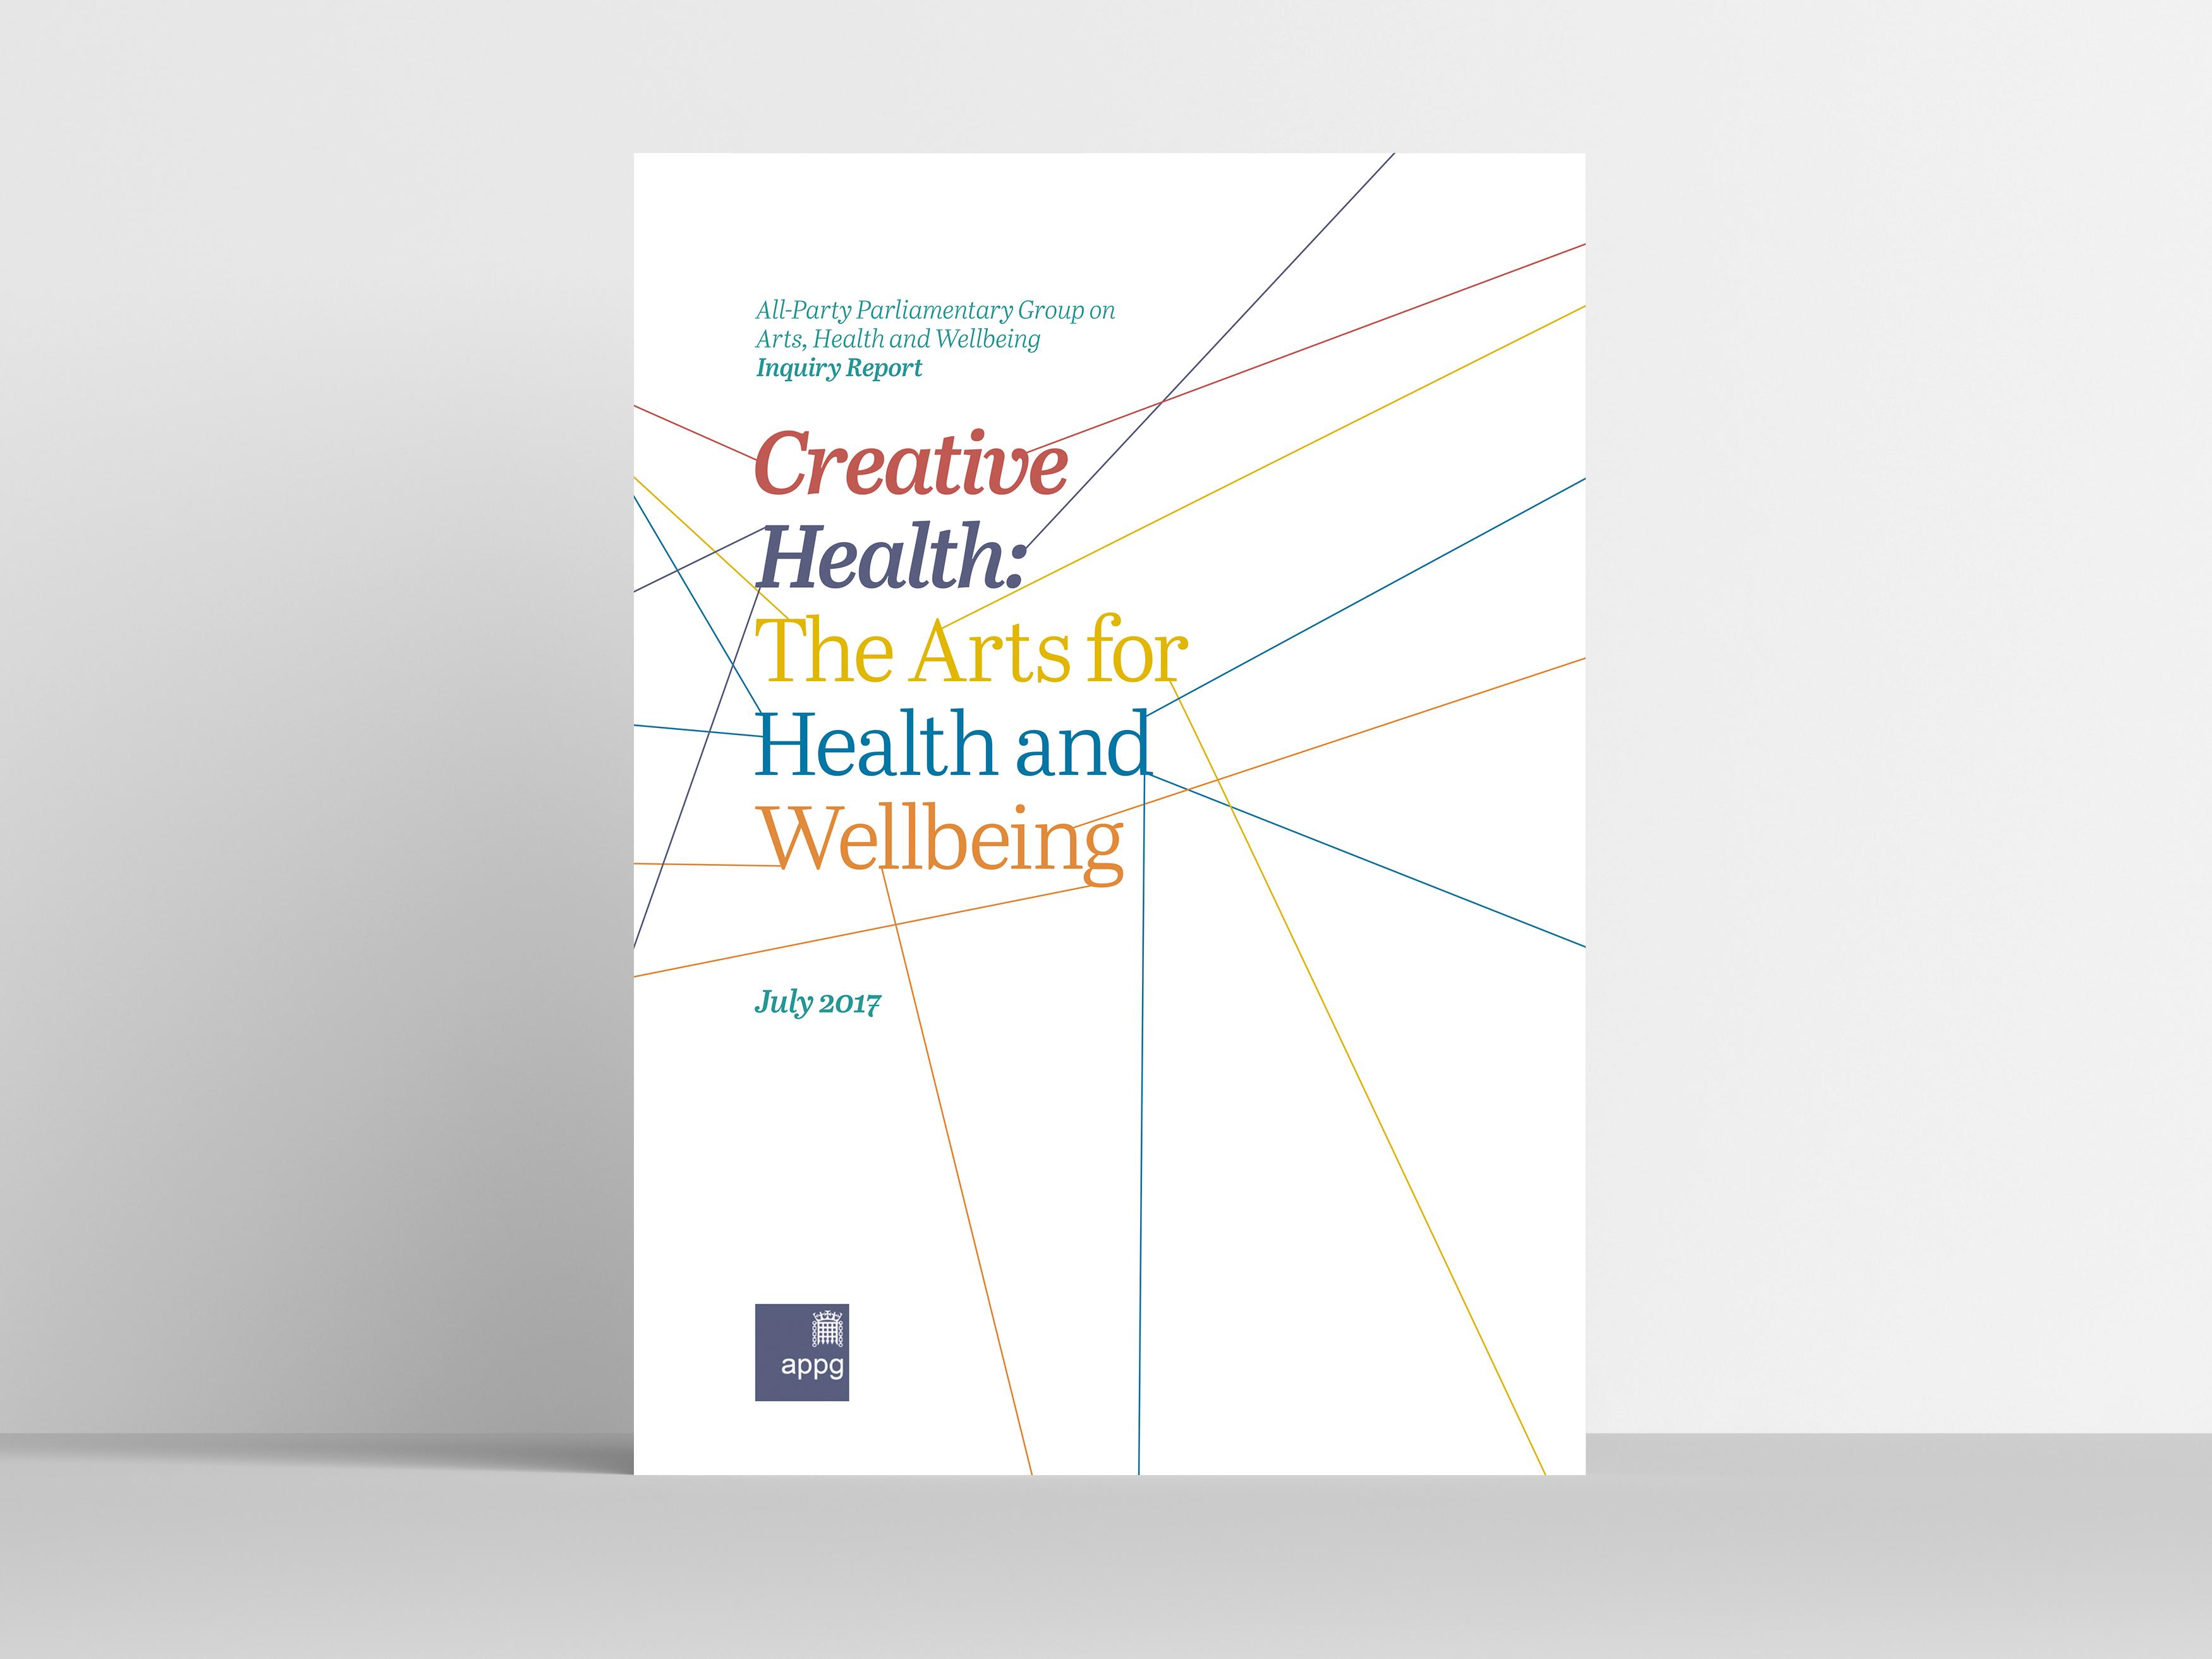 https://musica-music.co.uk/wp-content/uploads/2018/10/Creative-Health-Final.jpg